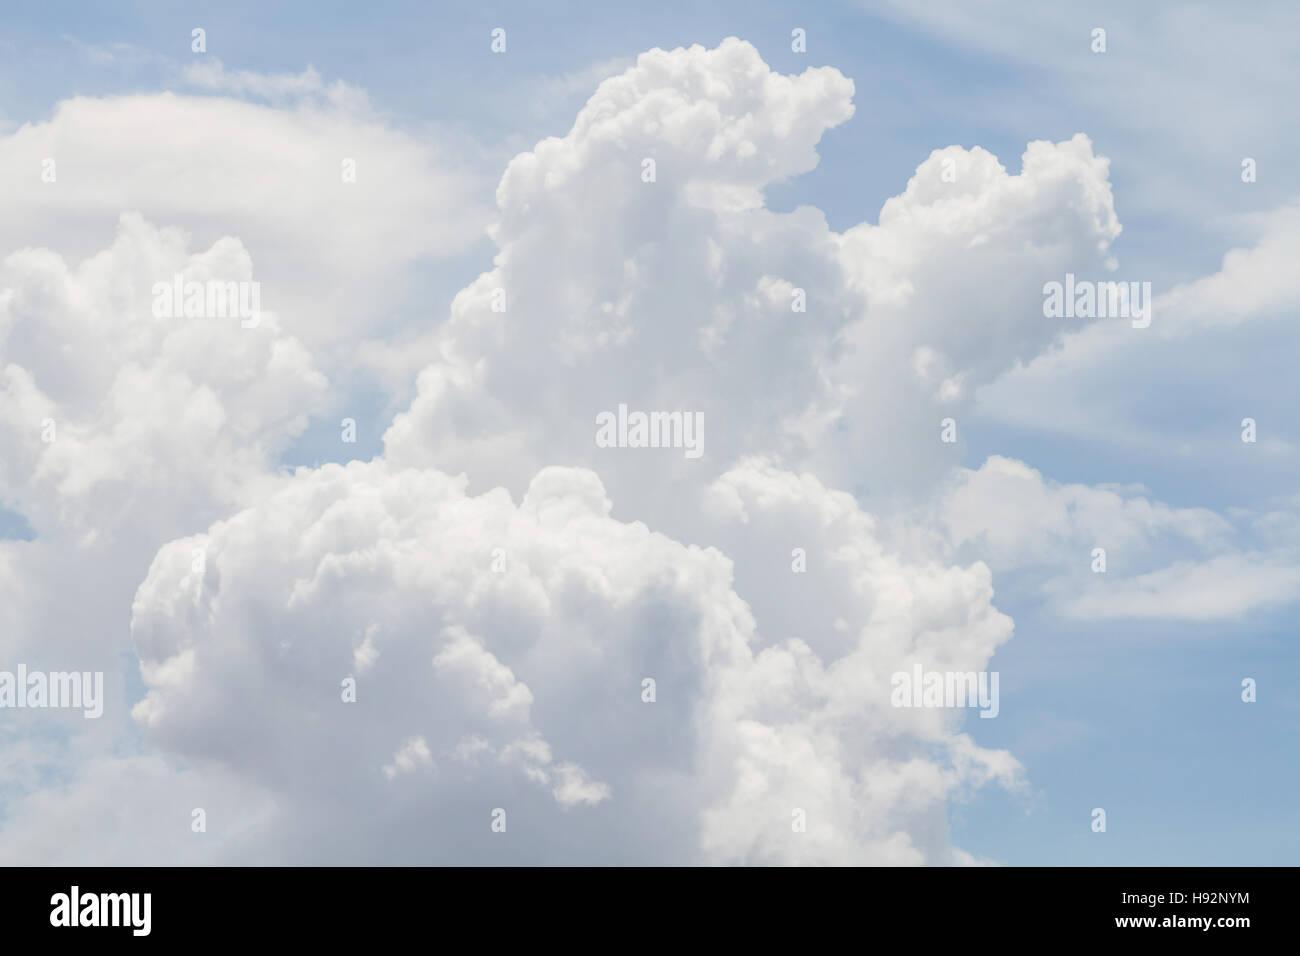 Clouds Form Phenomena. - Stock Image